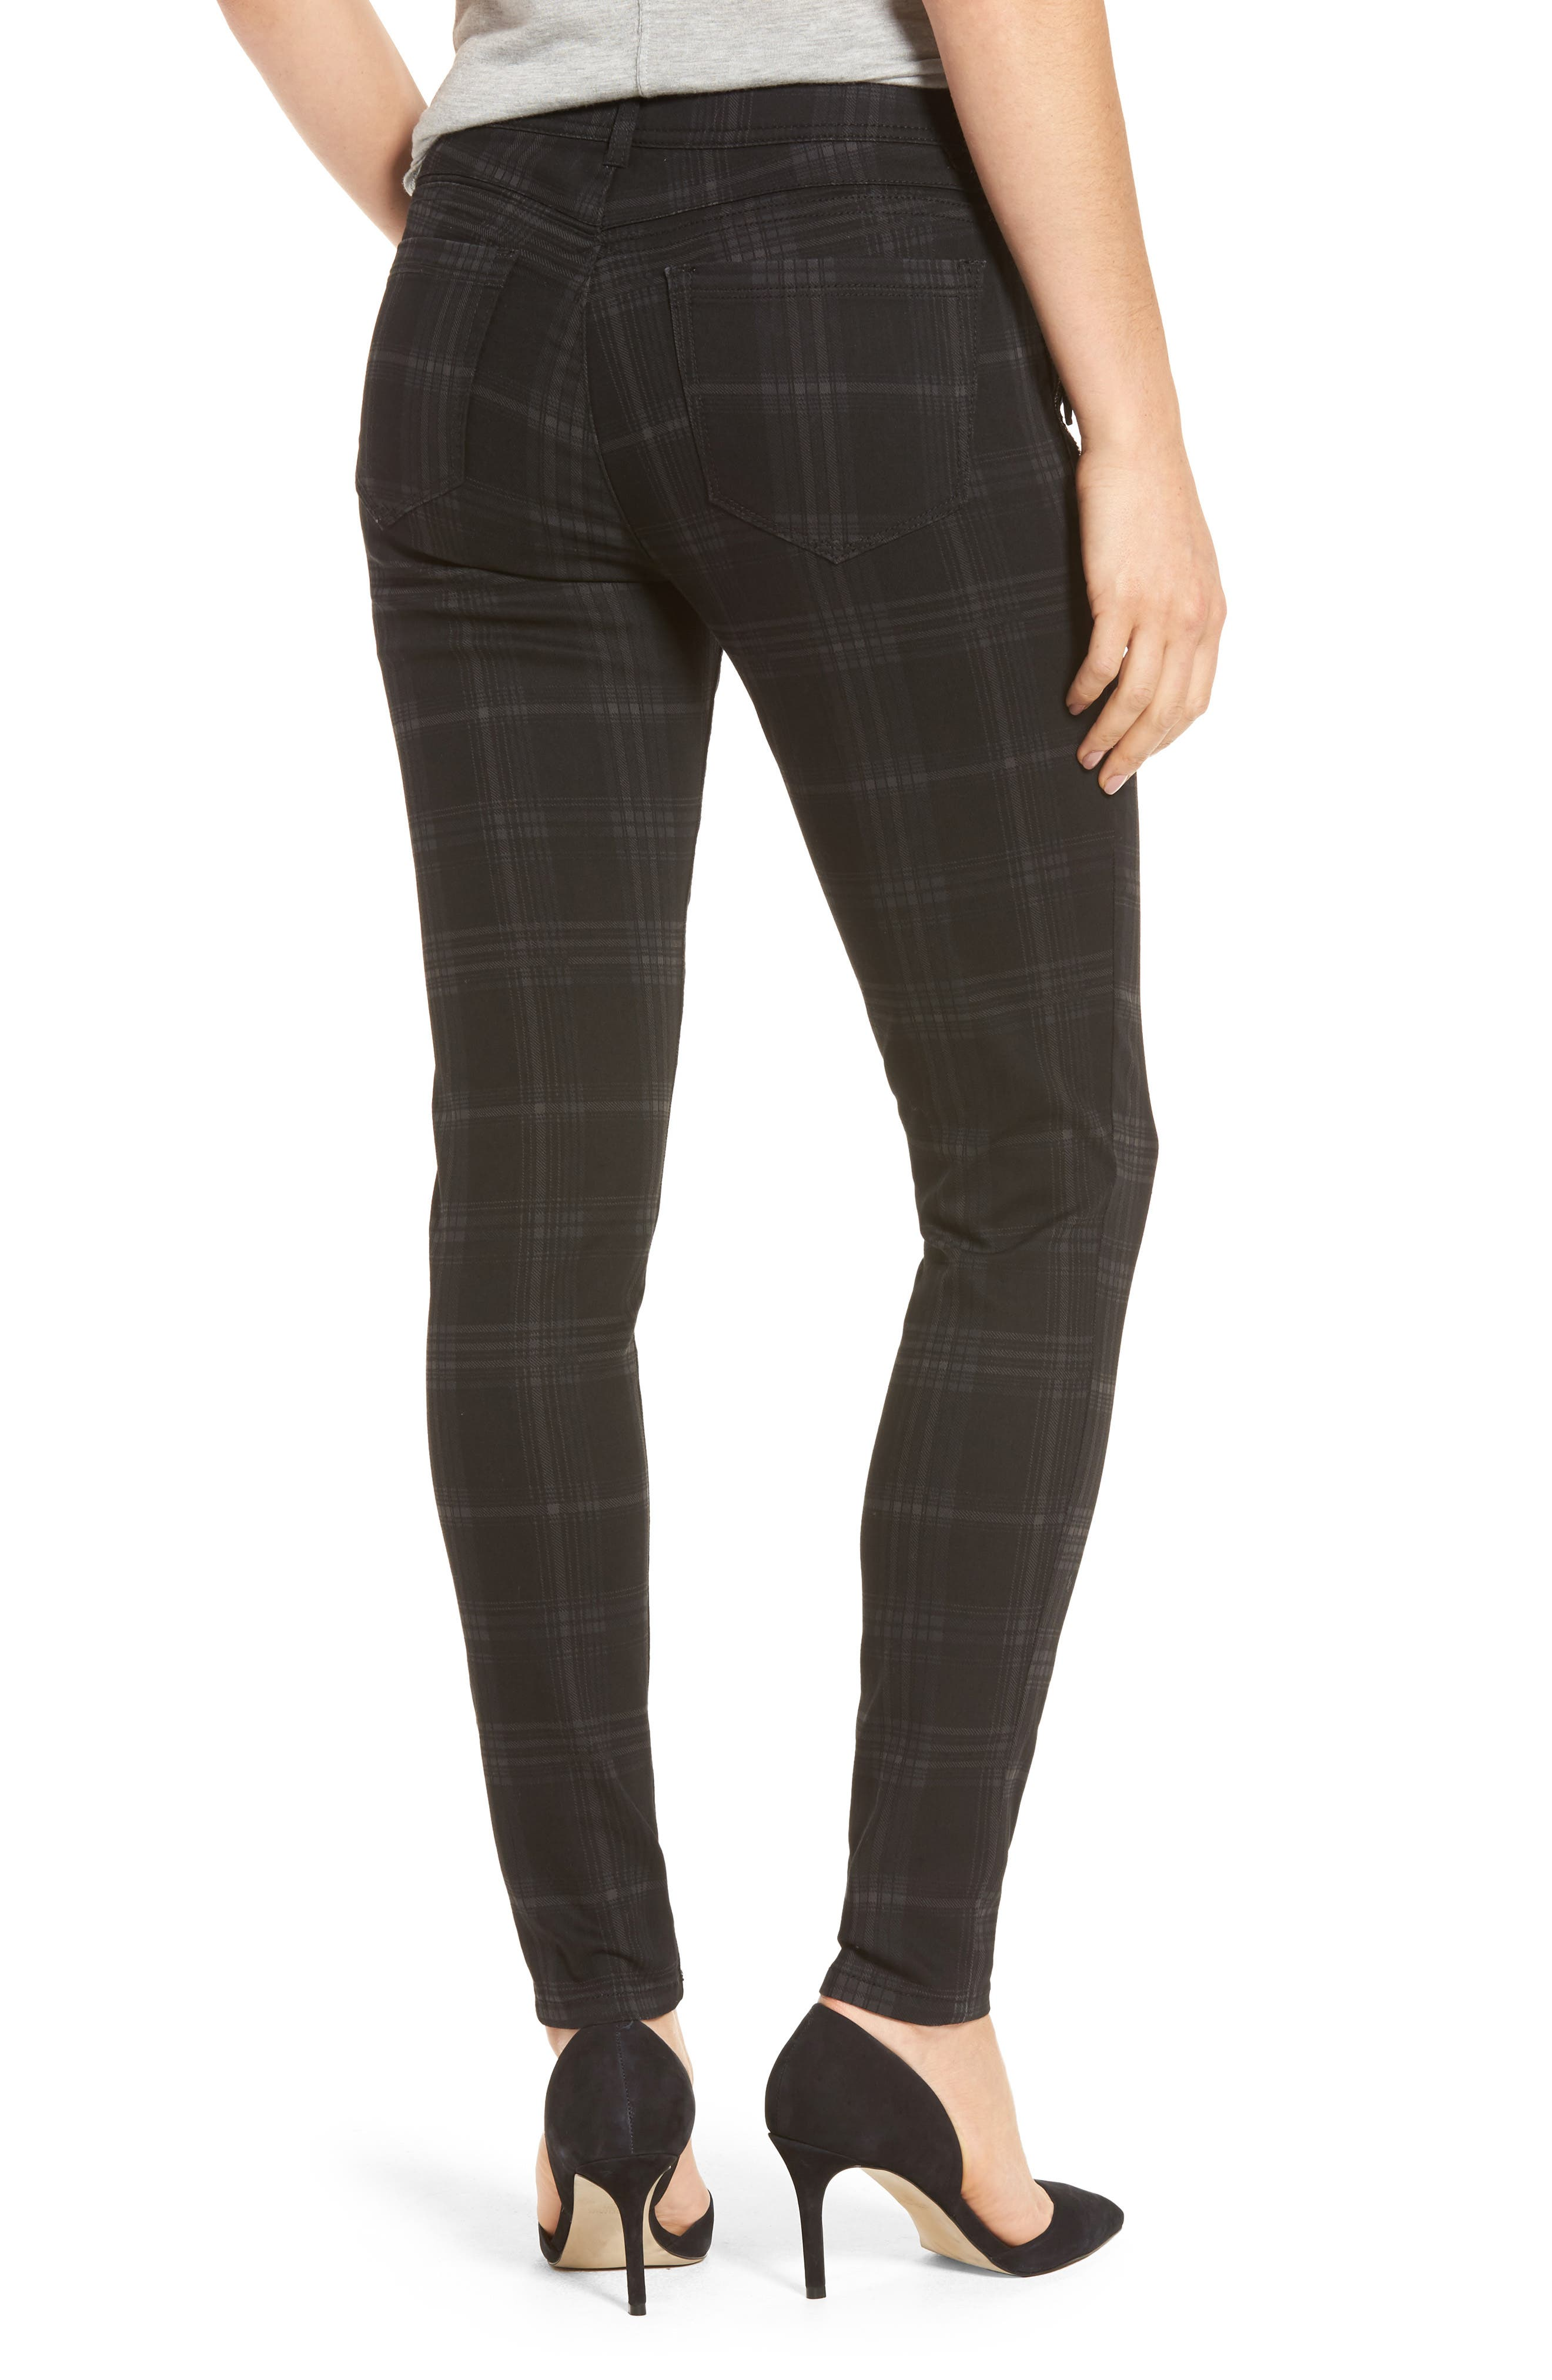 WIT & WISDOM, Ab-solution Side Zip Plaid Skinny Pants, Alternate thumbnail 2, color, BLACK